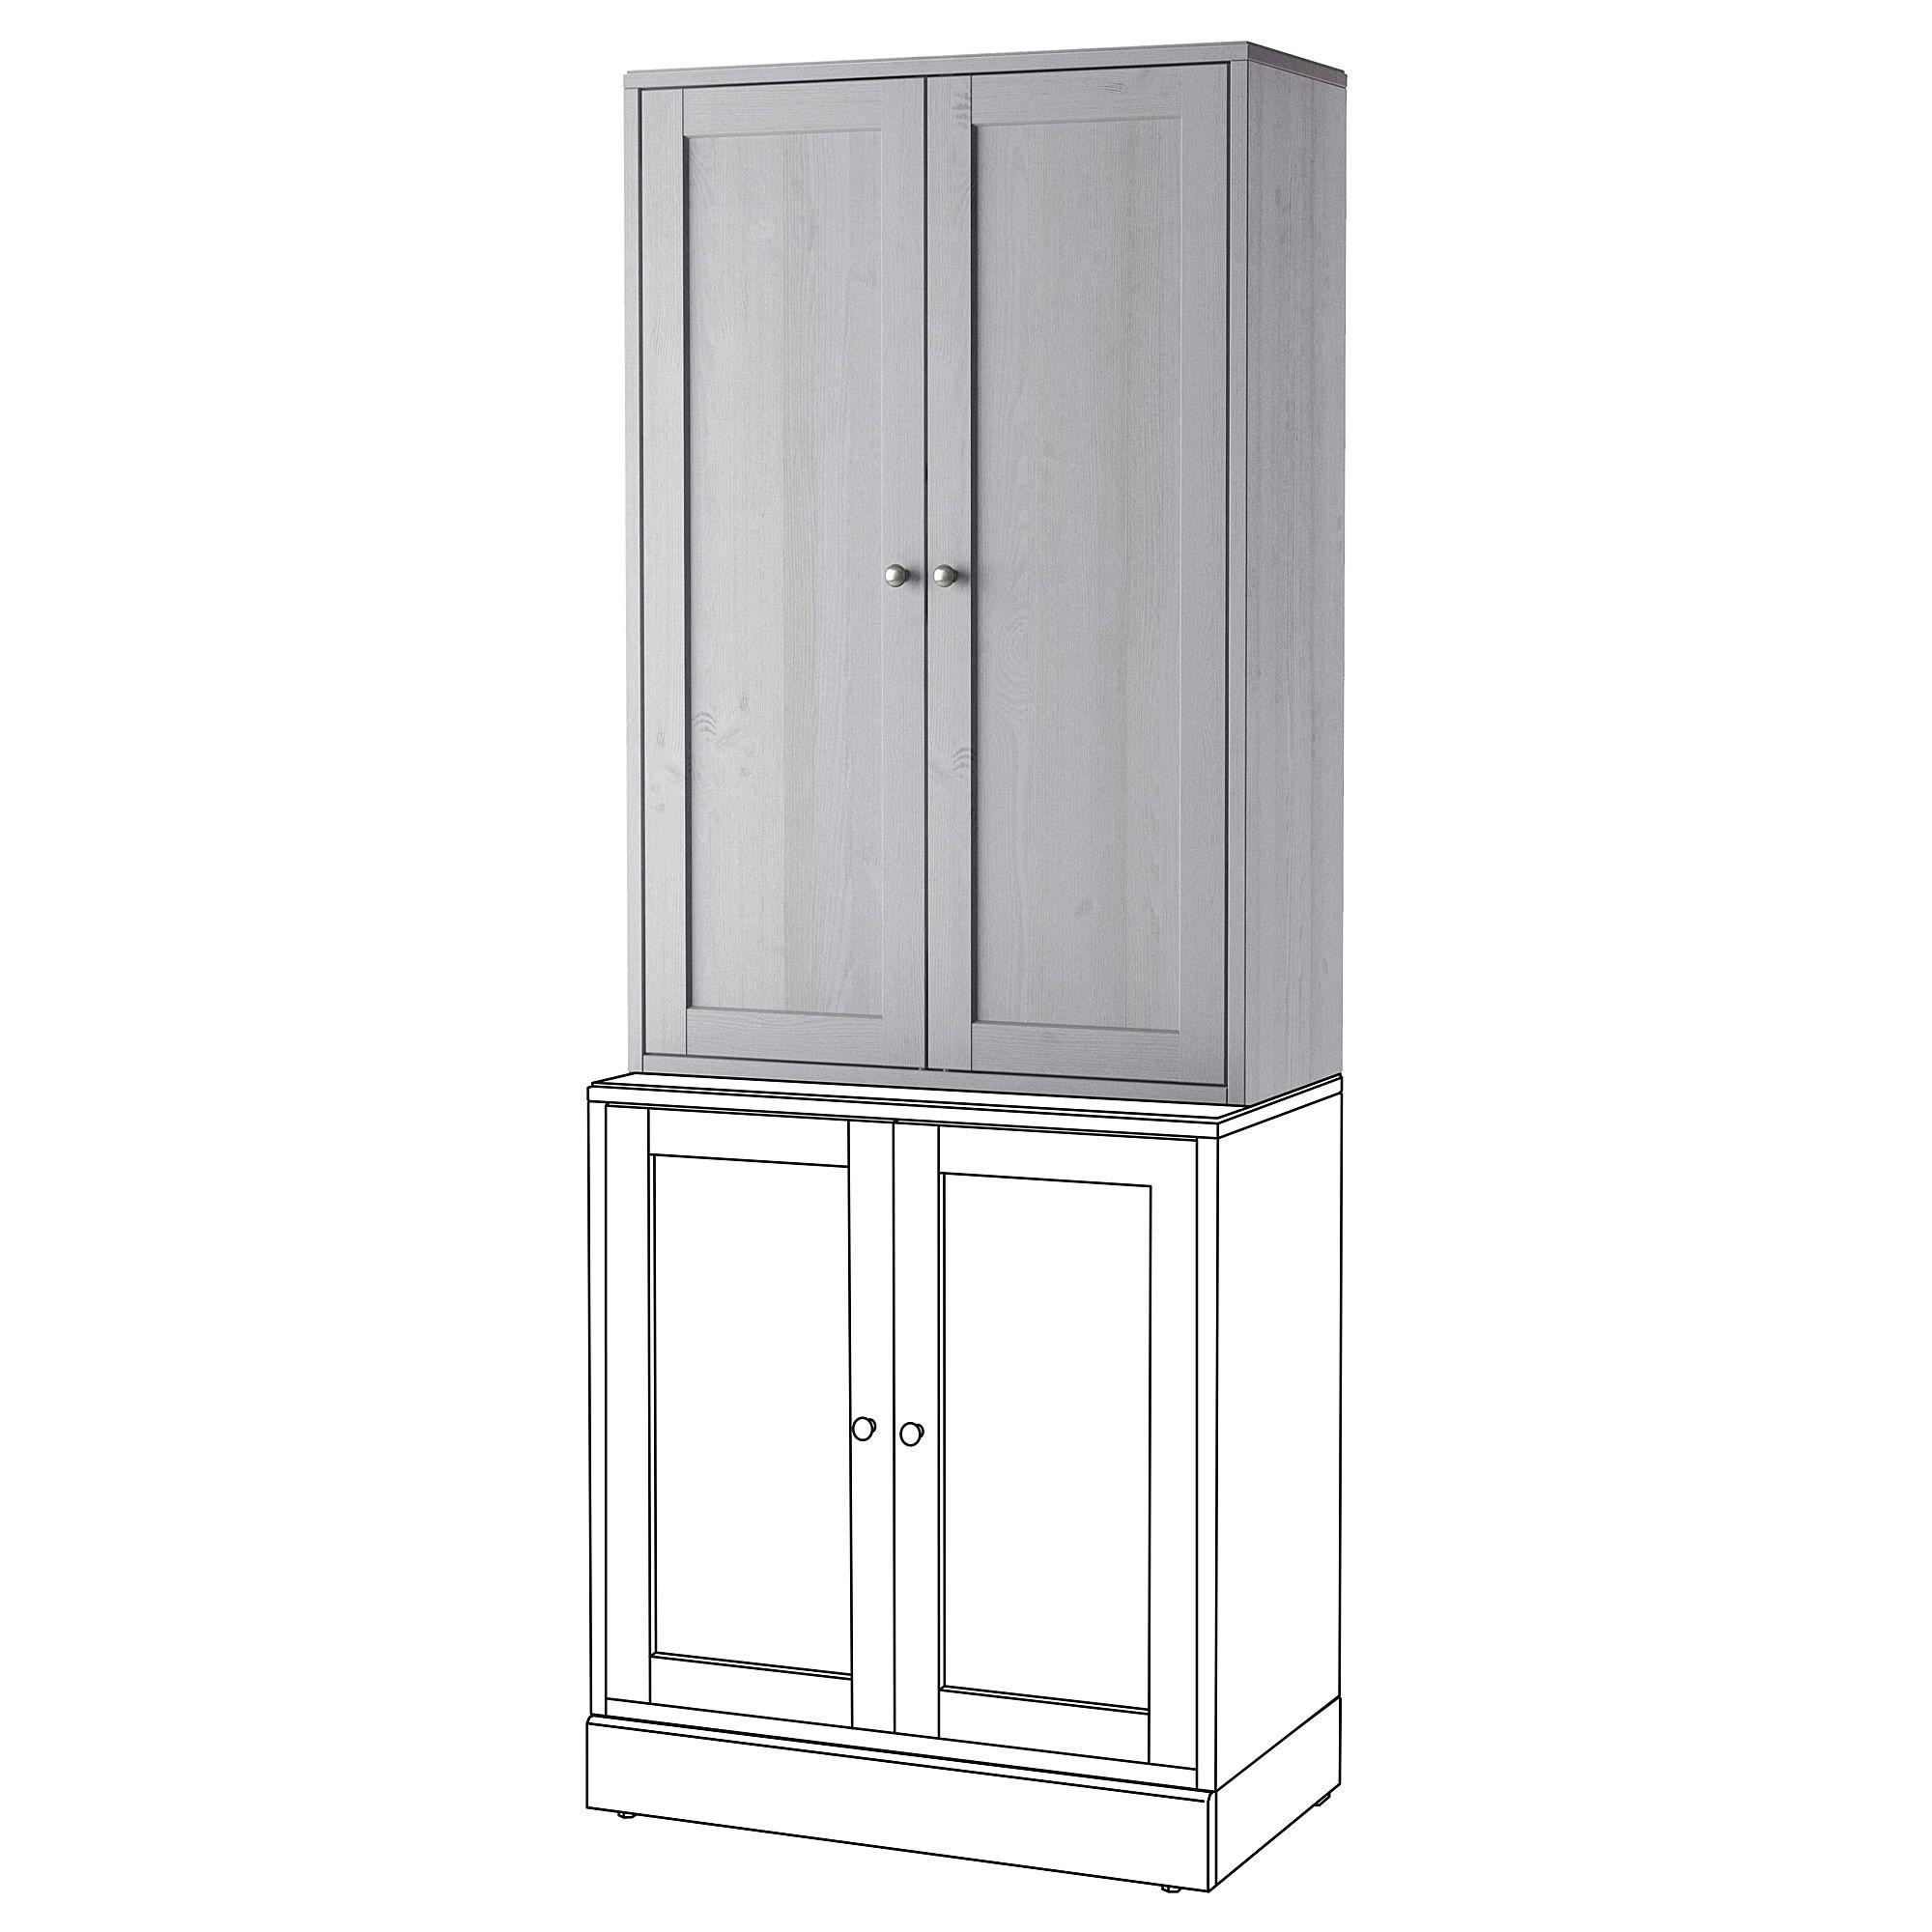 ikea havsta cabinet gray bookshelves tall cabinet storage rh pinterest com